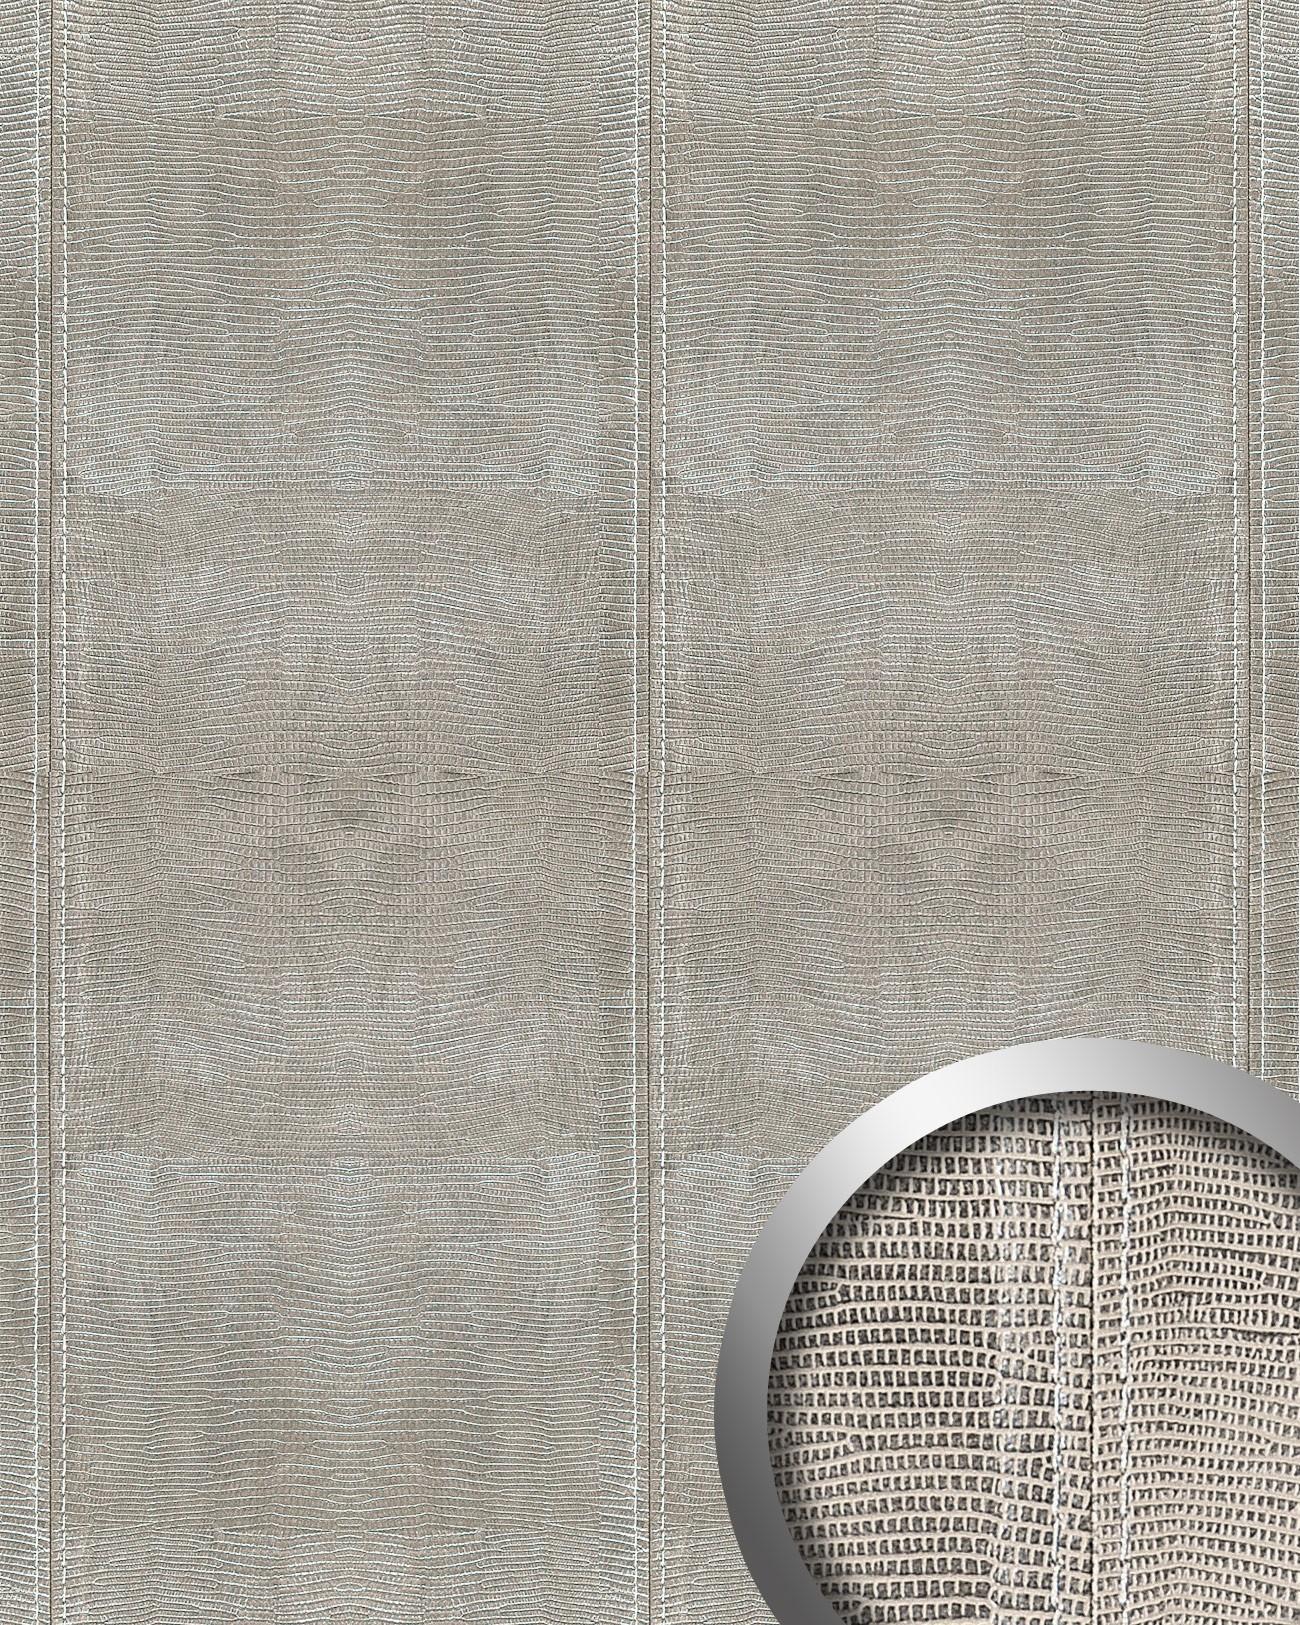 leguan design rev tement mural auto adh sif wallface 15006 simili cuir peau iguane surpiq res. Black Bedroom Furniture Sets. Home Design Ideas